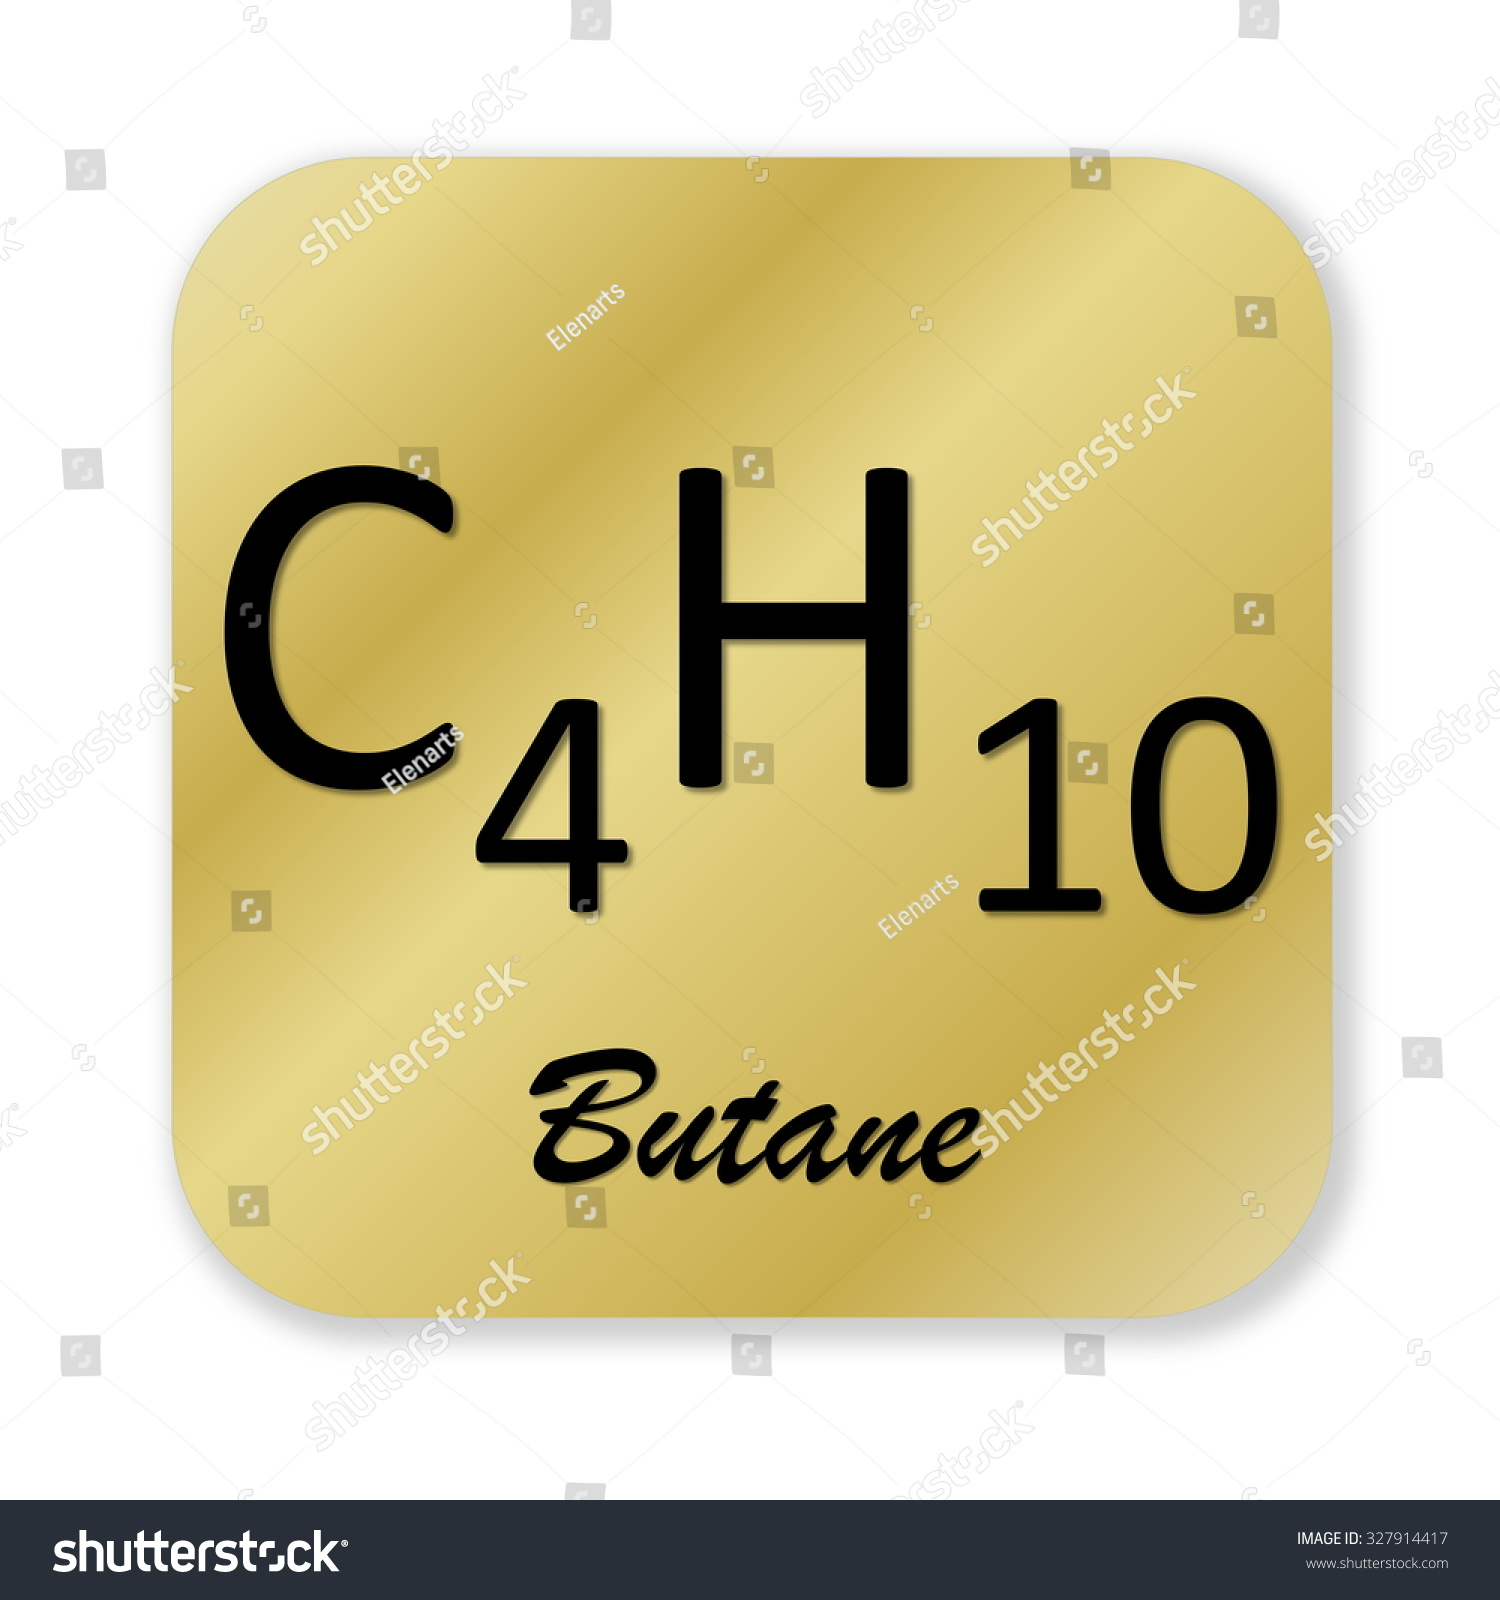 Royalty Free Stock Illustration Of Golden Chemical Formula Butane